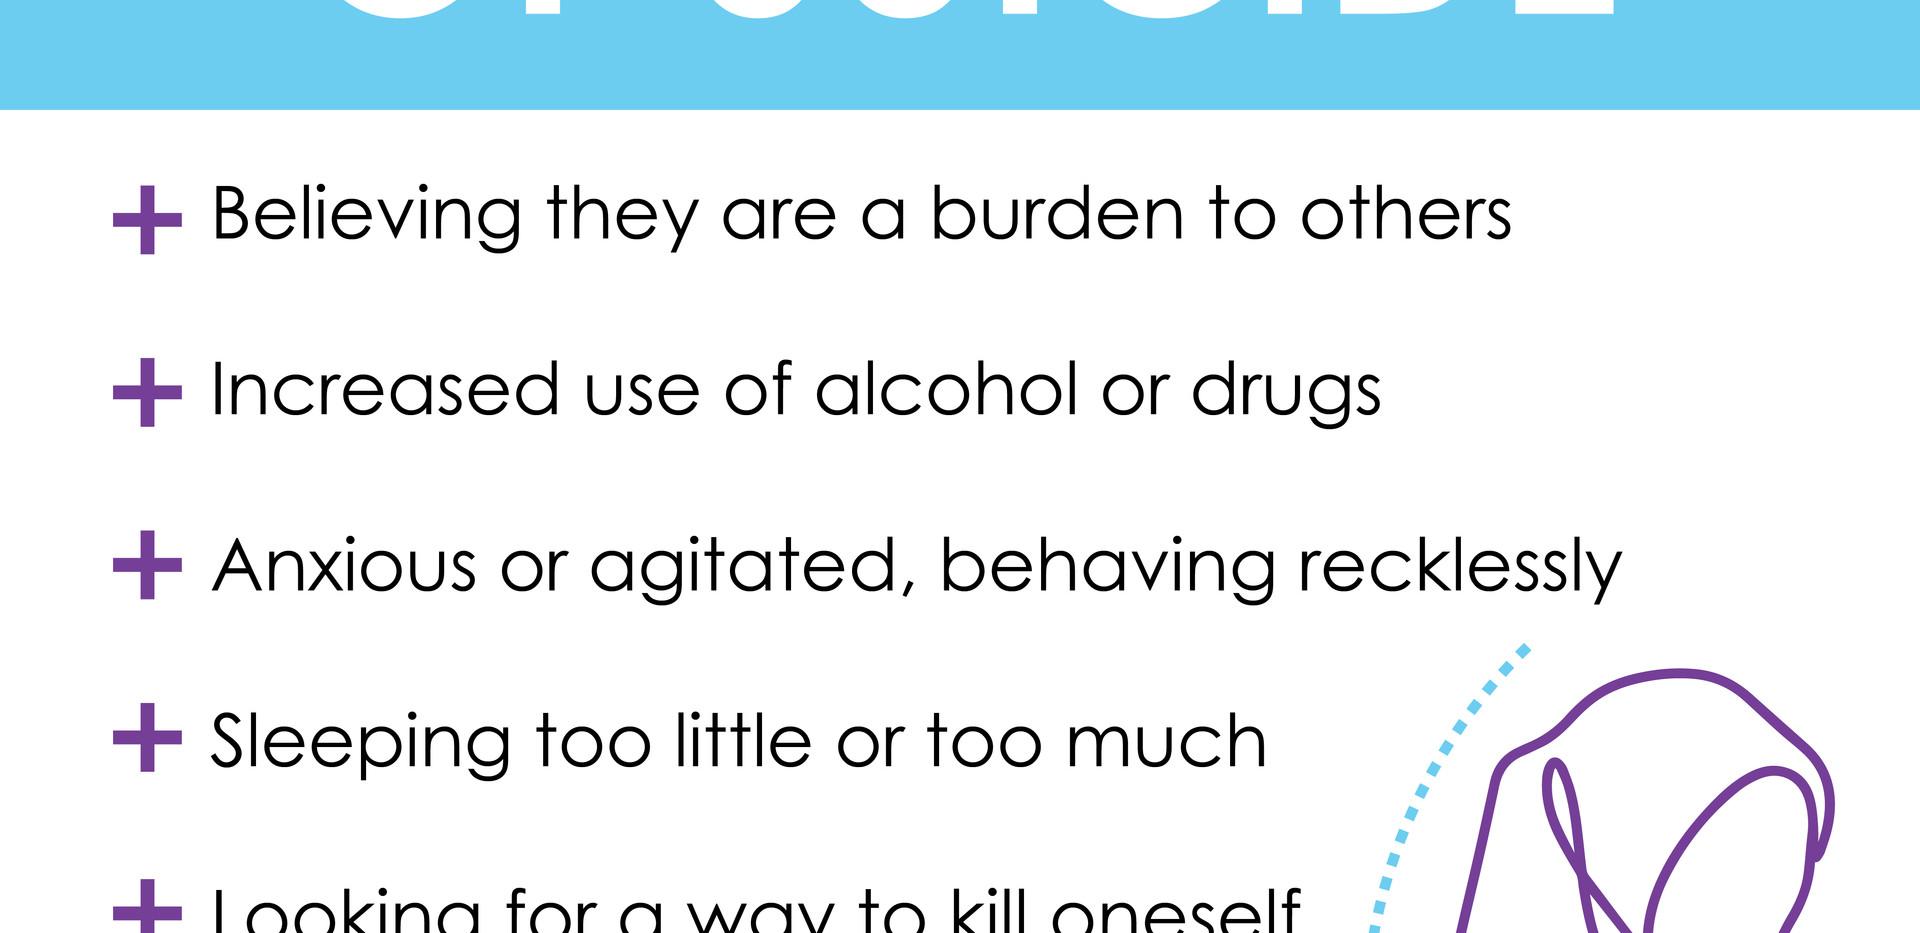 Behavioral Signs of Suicide